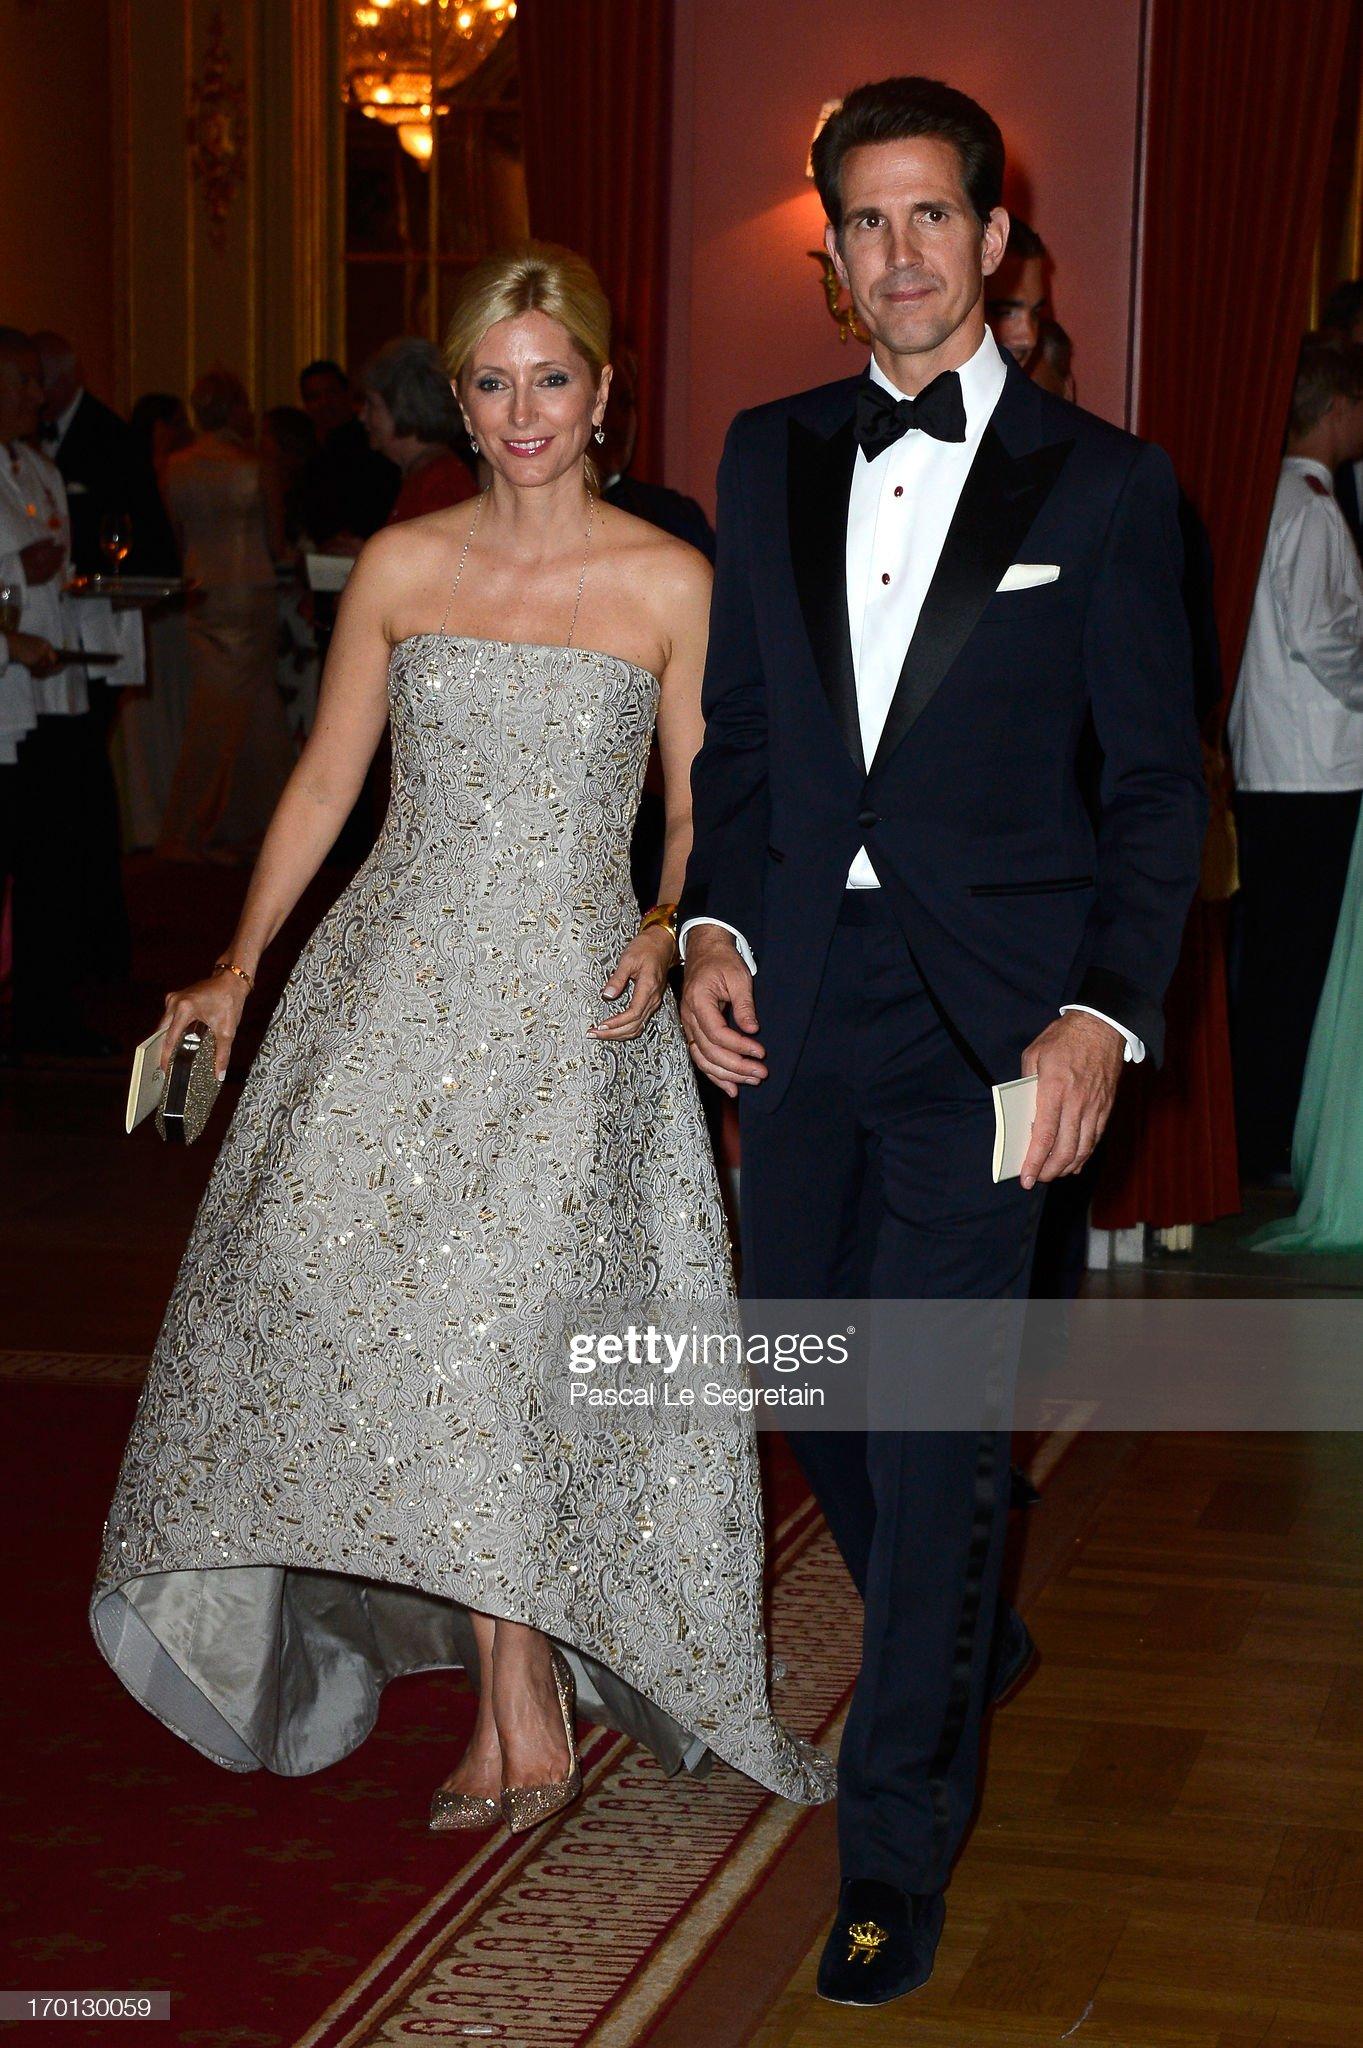 King Carl Gustav & Queen Silvia Host Private Dinner For The Wedding Of Princess Madeleine & Christopher O'Neill- Inside Arrivals : News Photo